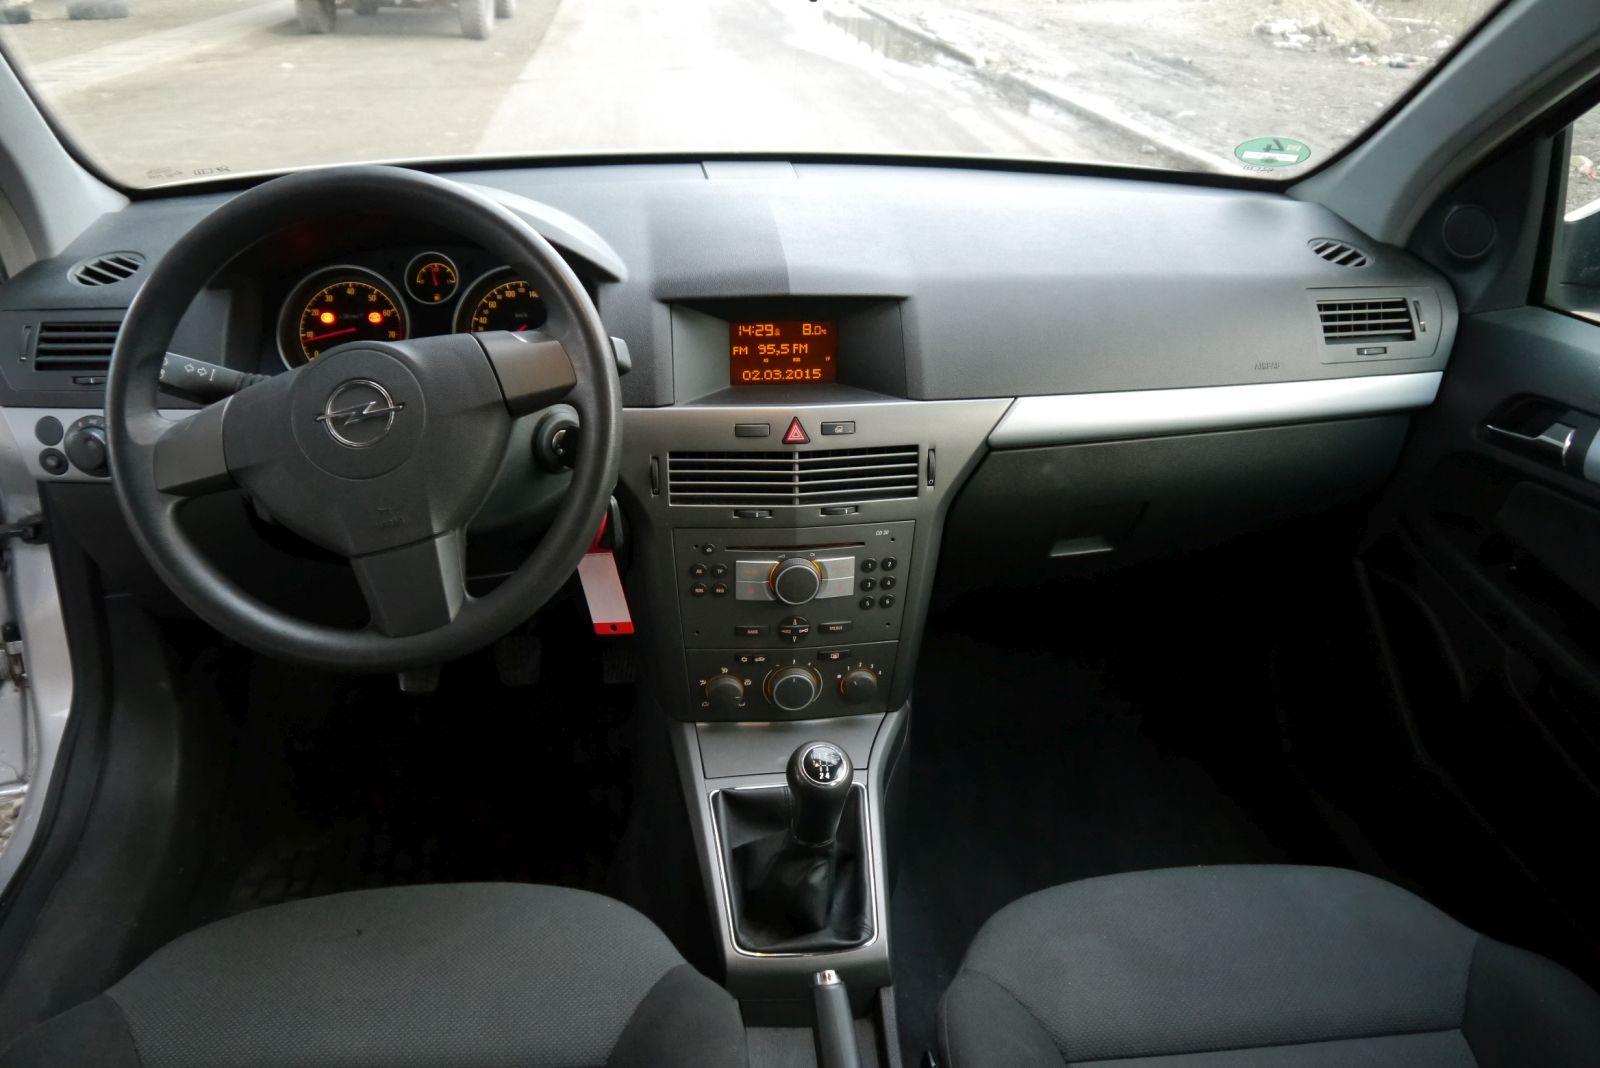 Best Interieur Opel Astra H Ideas - Ideeën Voor Thuis - ibarakijets.org